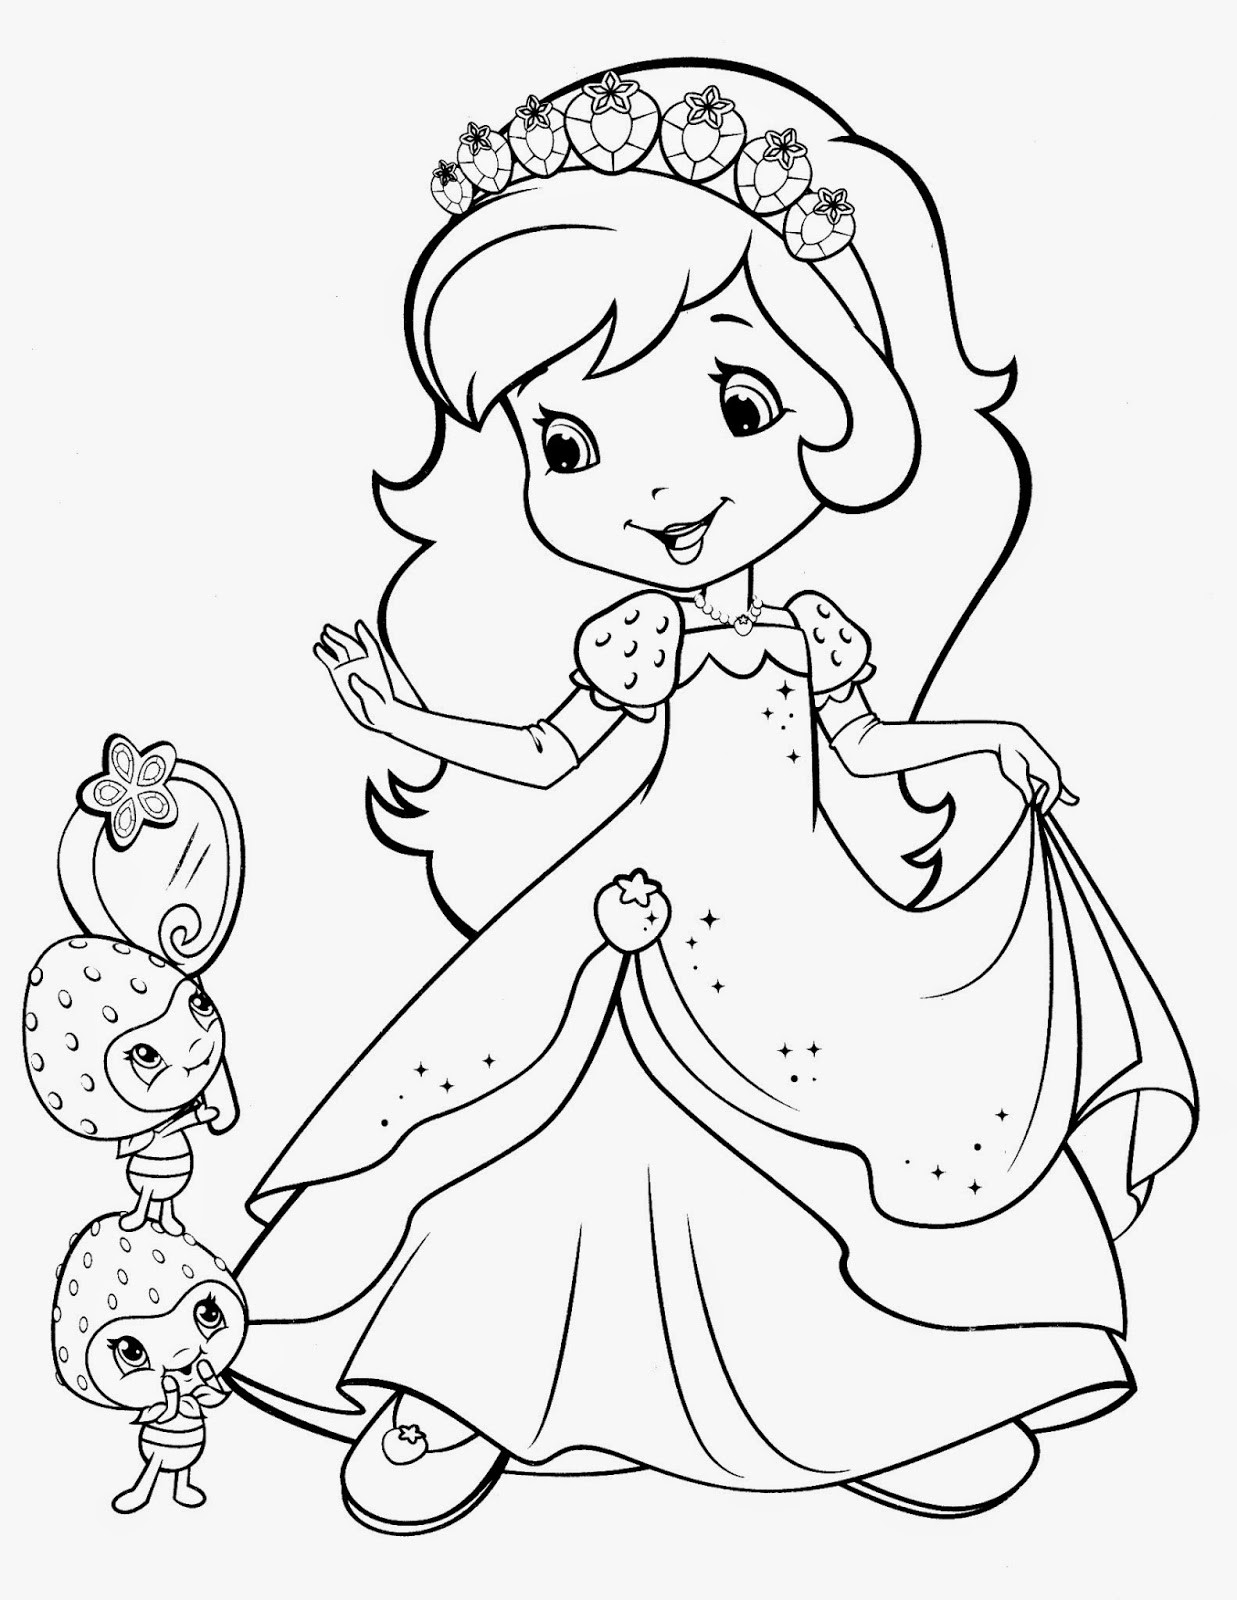 Strawberry Shortcake Coloring Page  Princess Strawberry Shortcake Coloring Pages